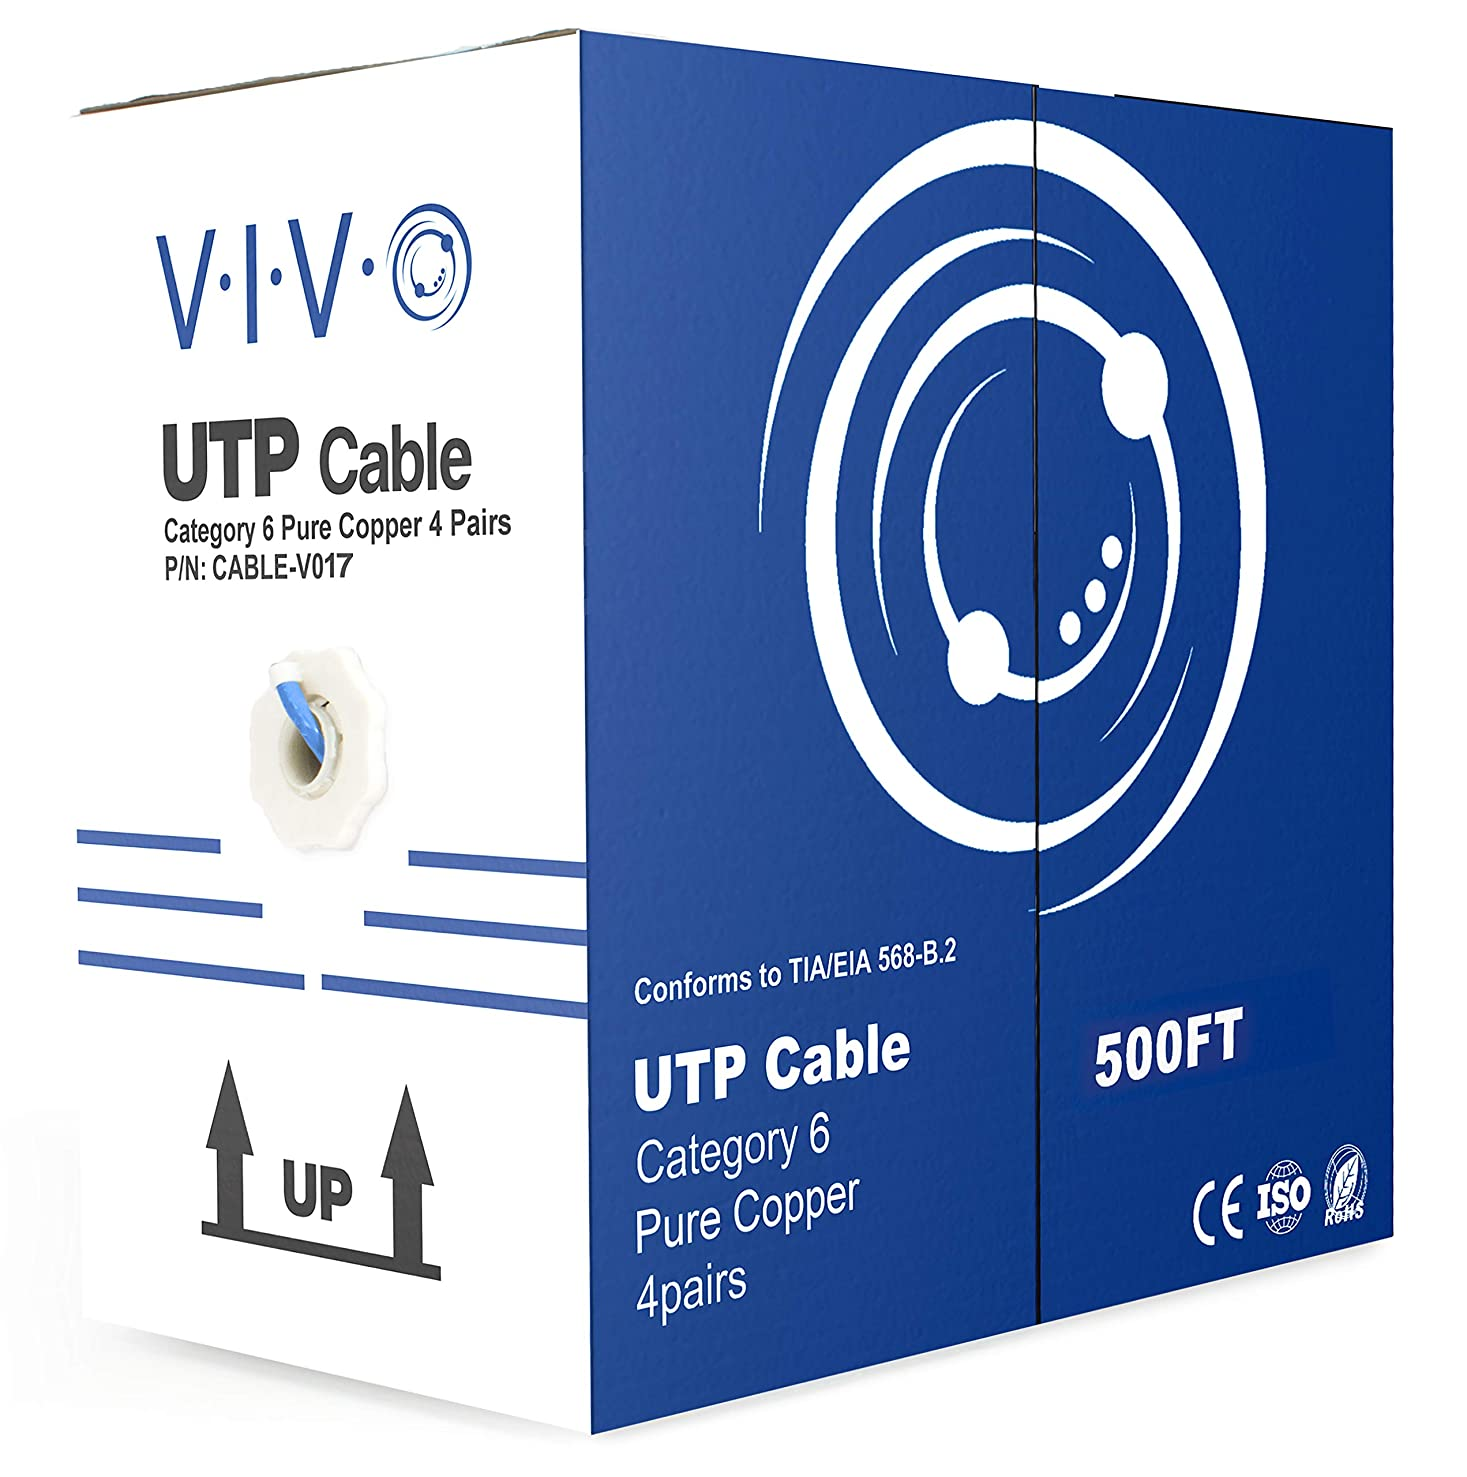 VIVO Blue 500ft Bulk Cat6 Full Copper 23 AWG Indoor LAN Ethernet Cable Wire | UTP Pull Box 500 ft Cat-6 Copper (CABLE-V017)